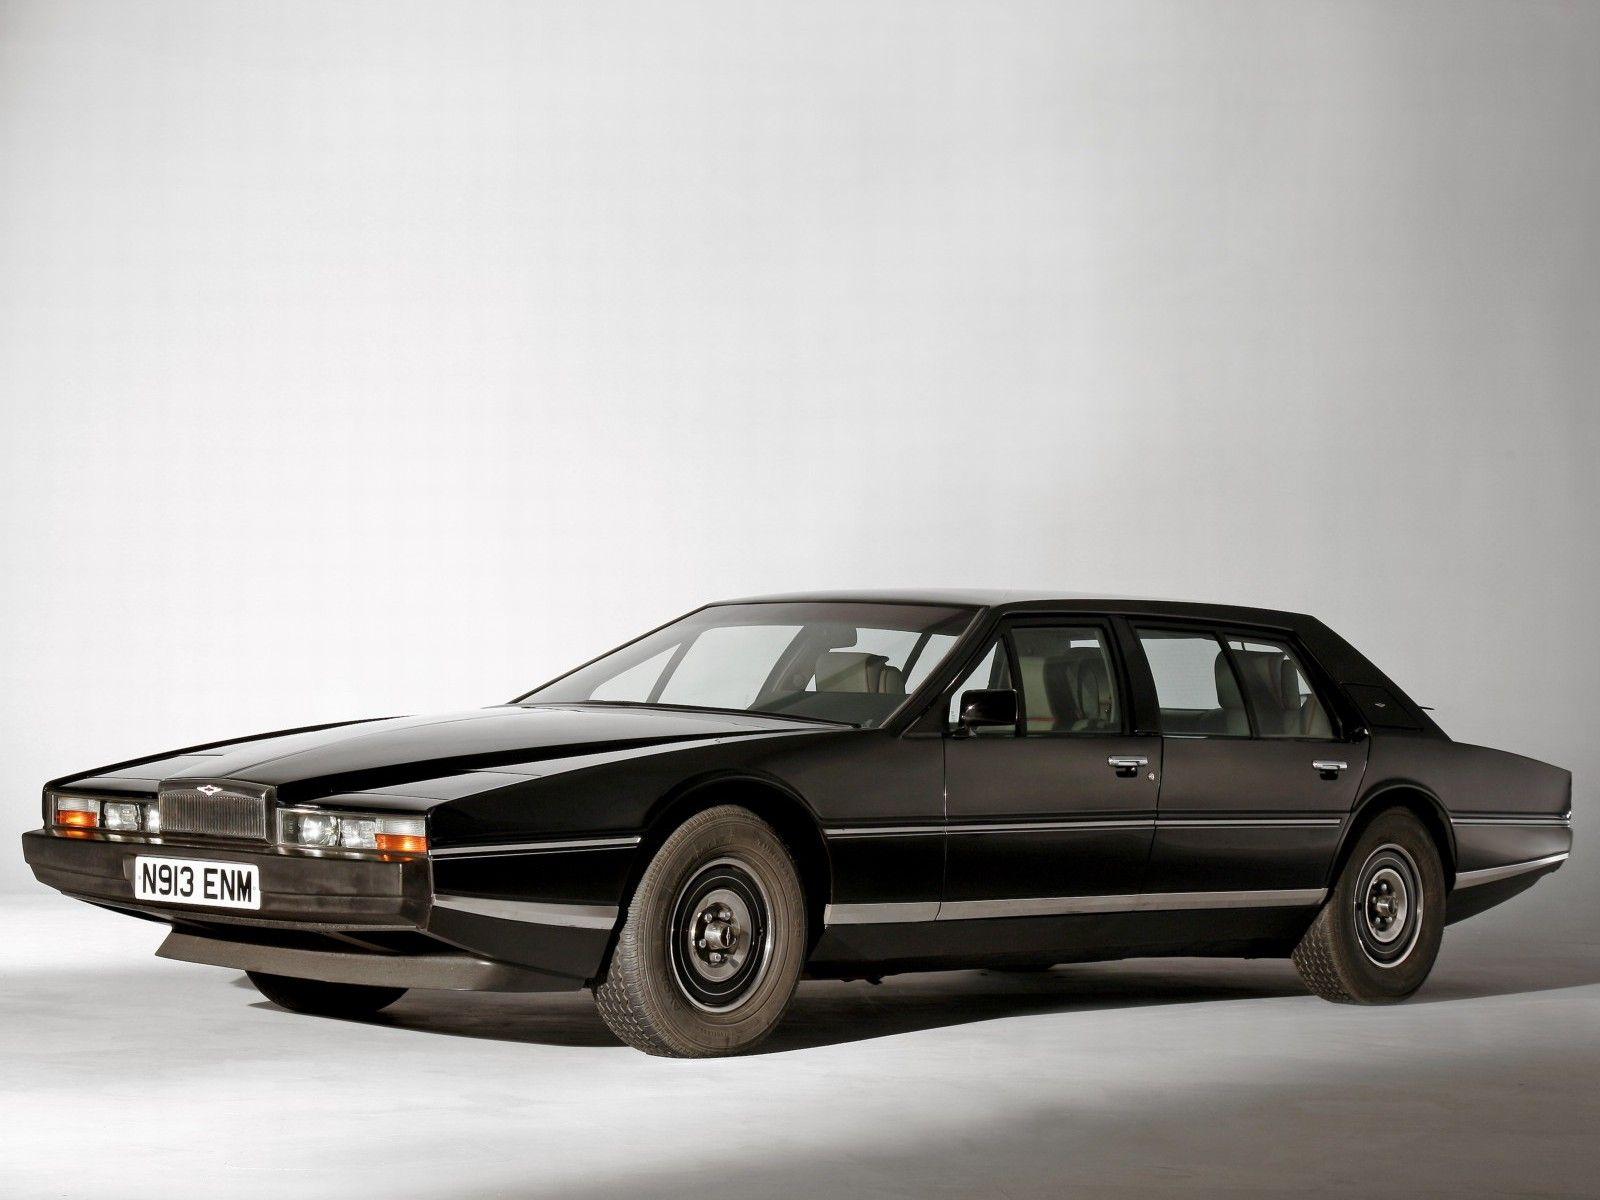 1984 Aston Martin Lagonda Limousine By Tickford